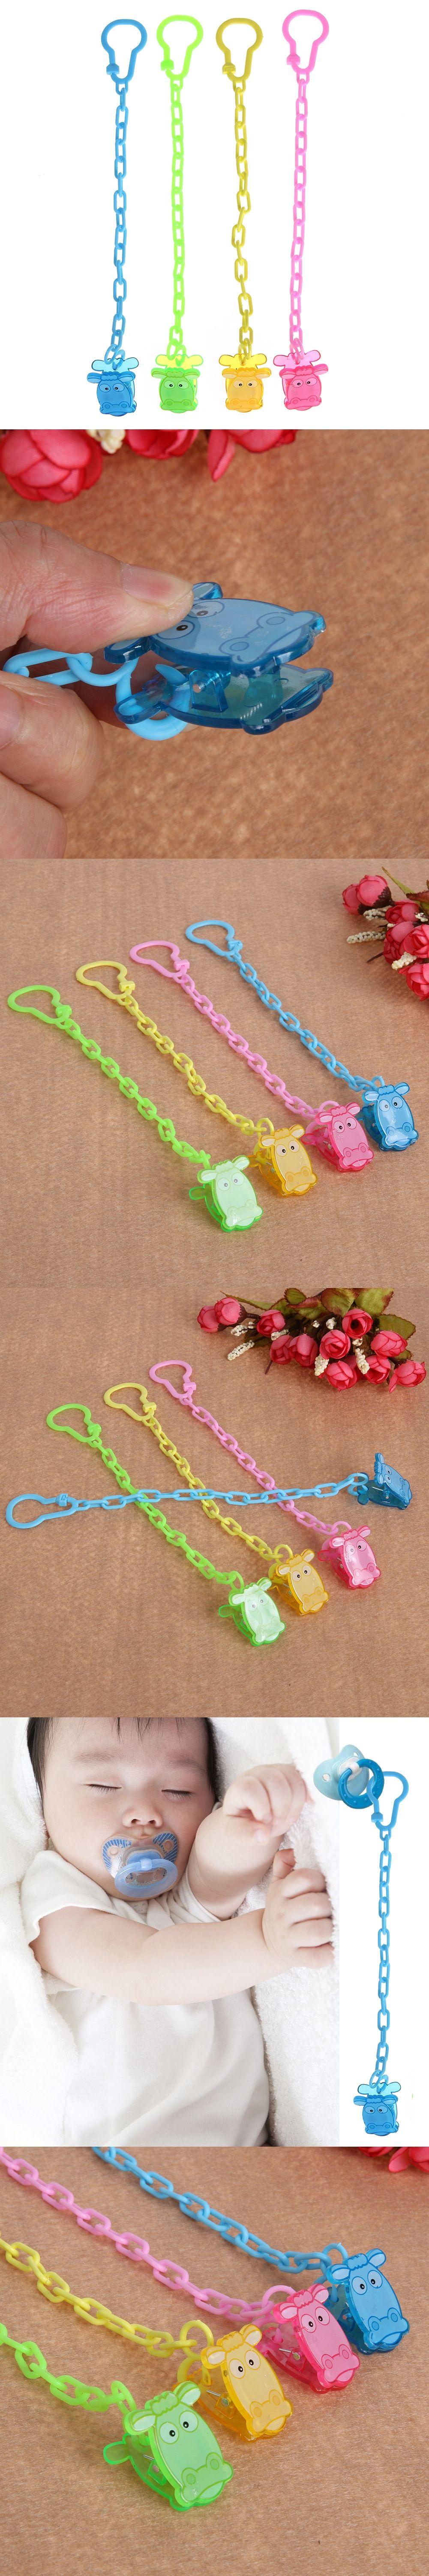 Baby Nipple Chain Anti Drop Pacifier Holder Clip Colorful Cartoon Newborn Wooden